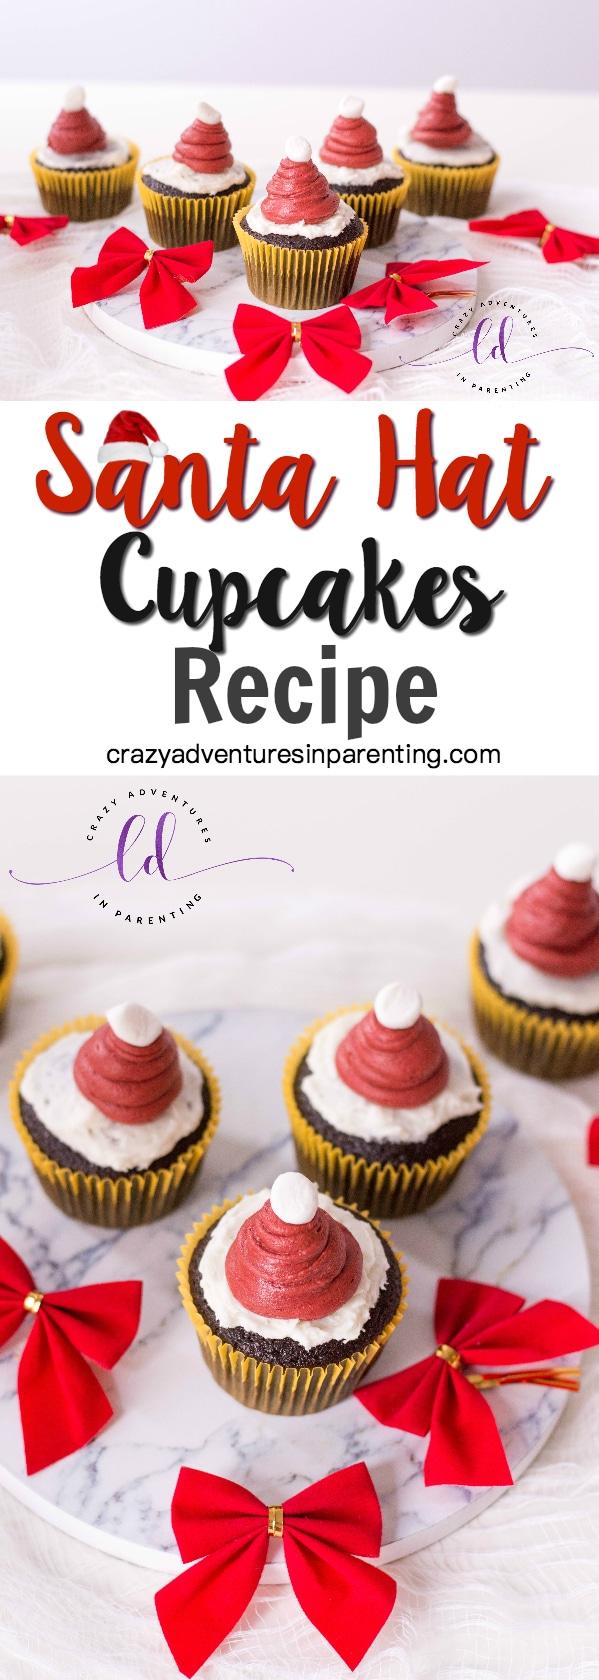 Santa Hat Cupcakes Recipe